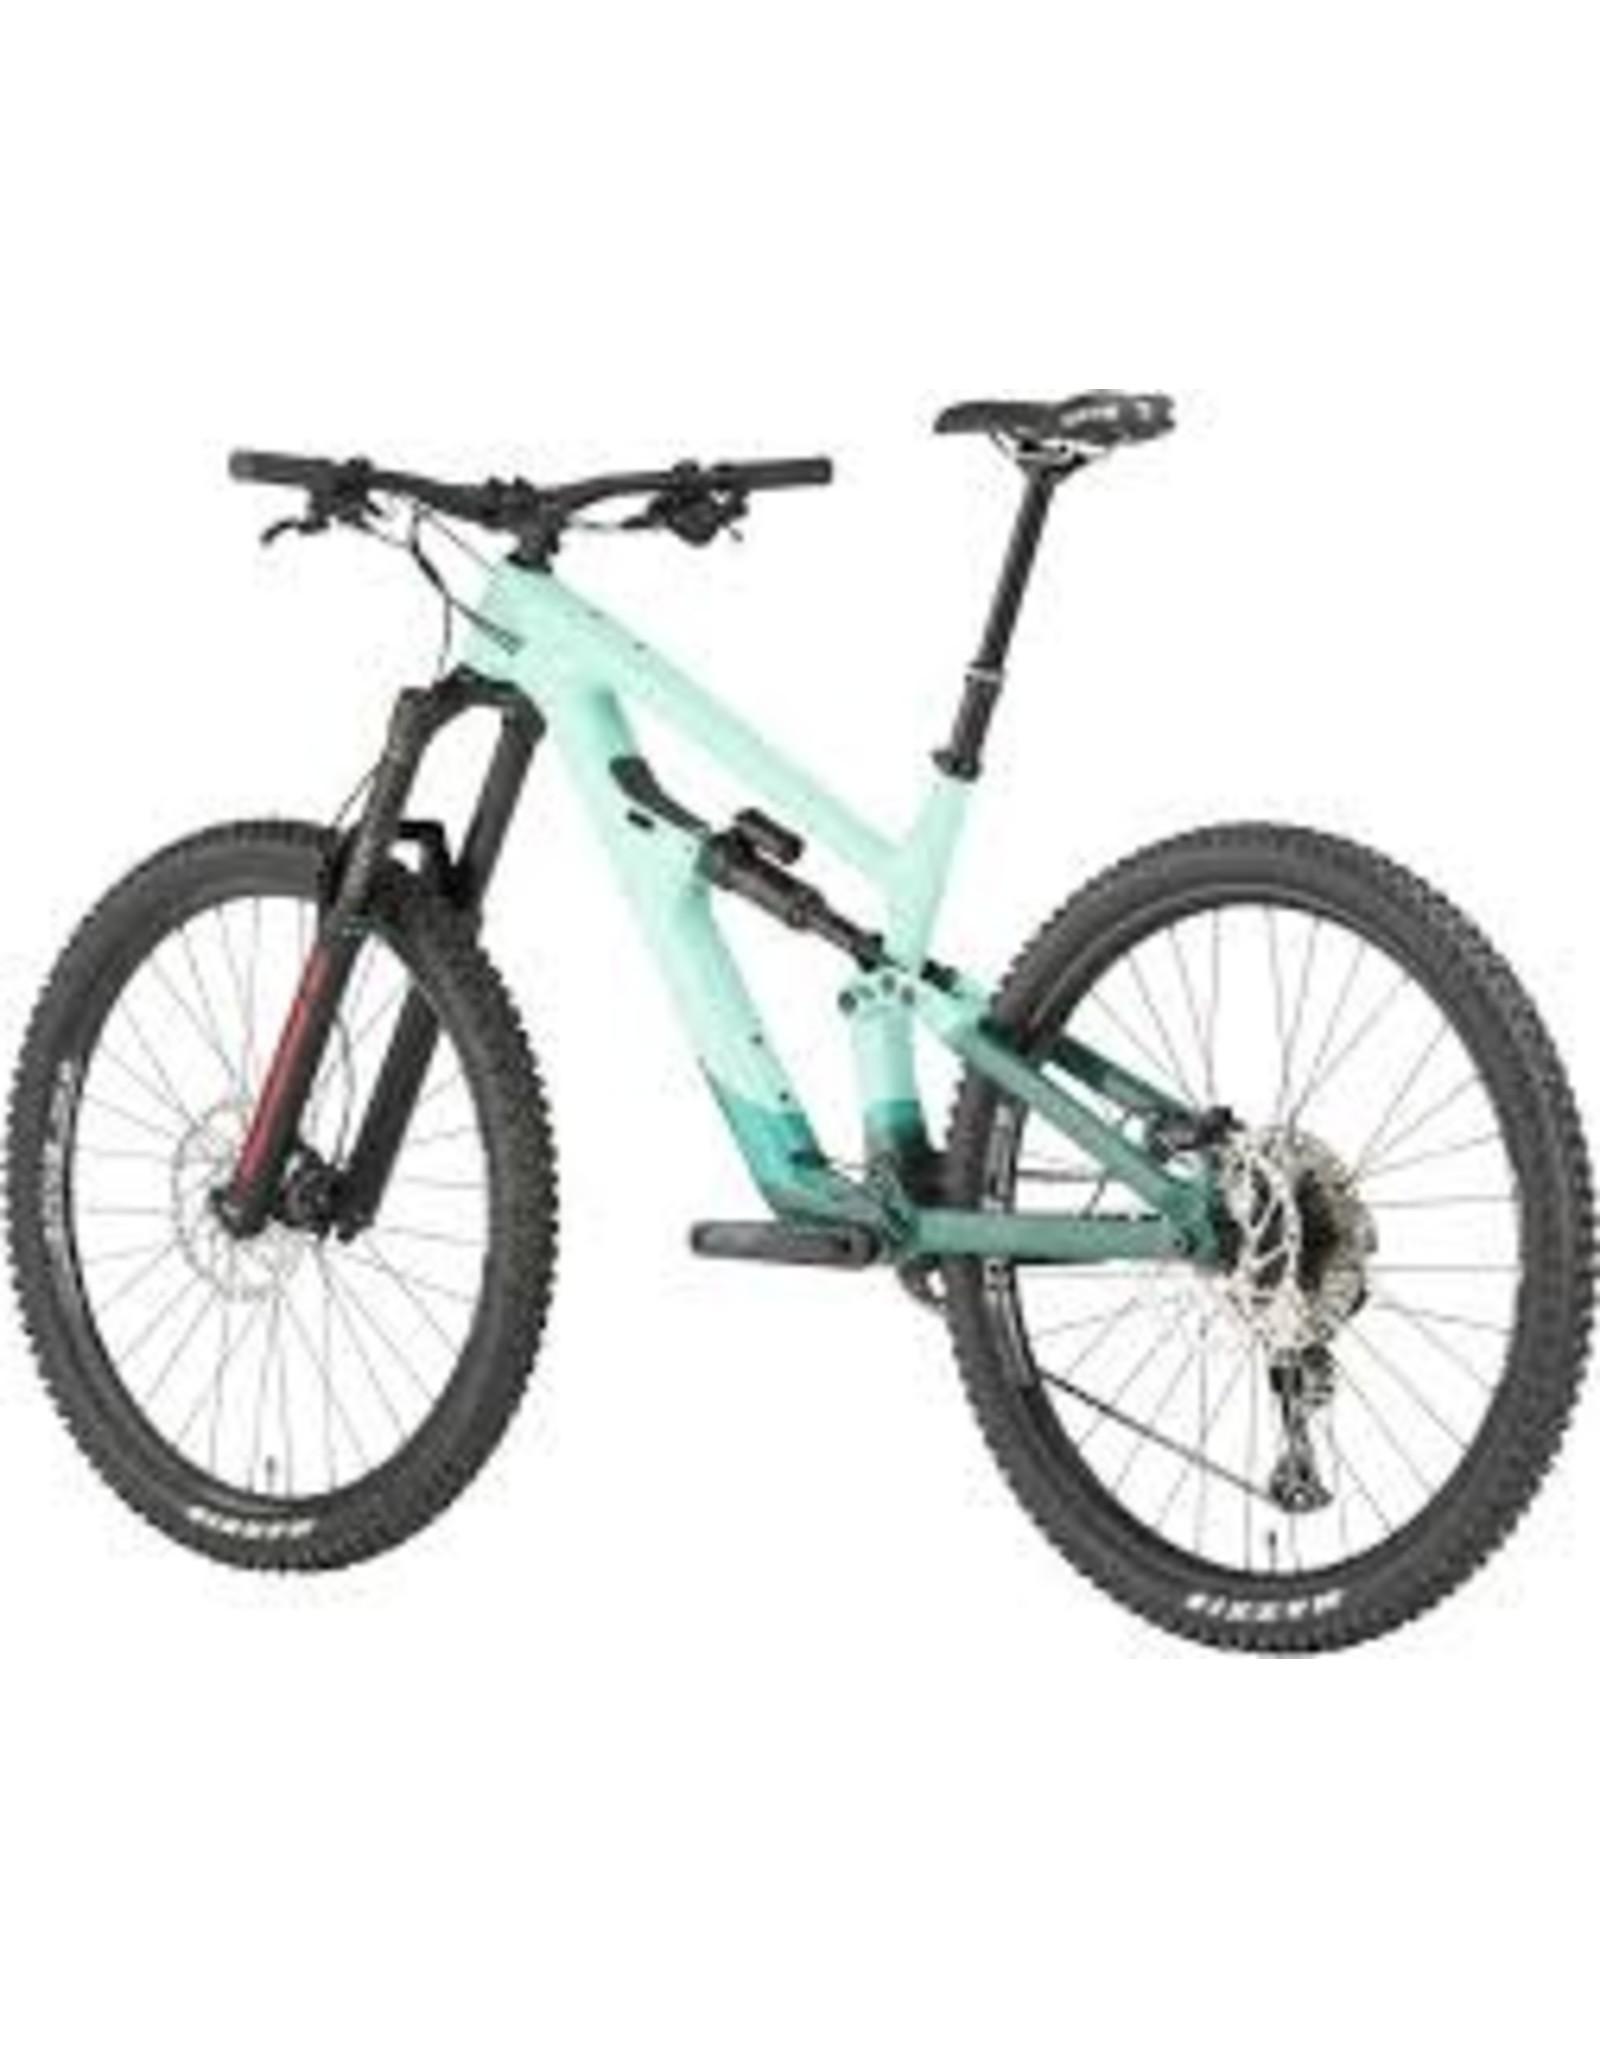 "Salsa Salsa Cassidy LARGE Carbon SLX Bike - 29"", Carbon, Green"